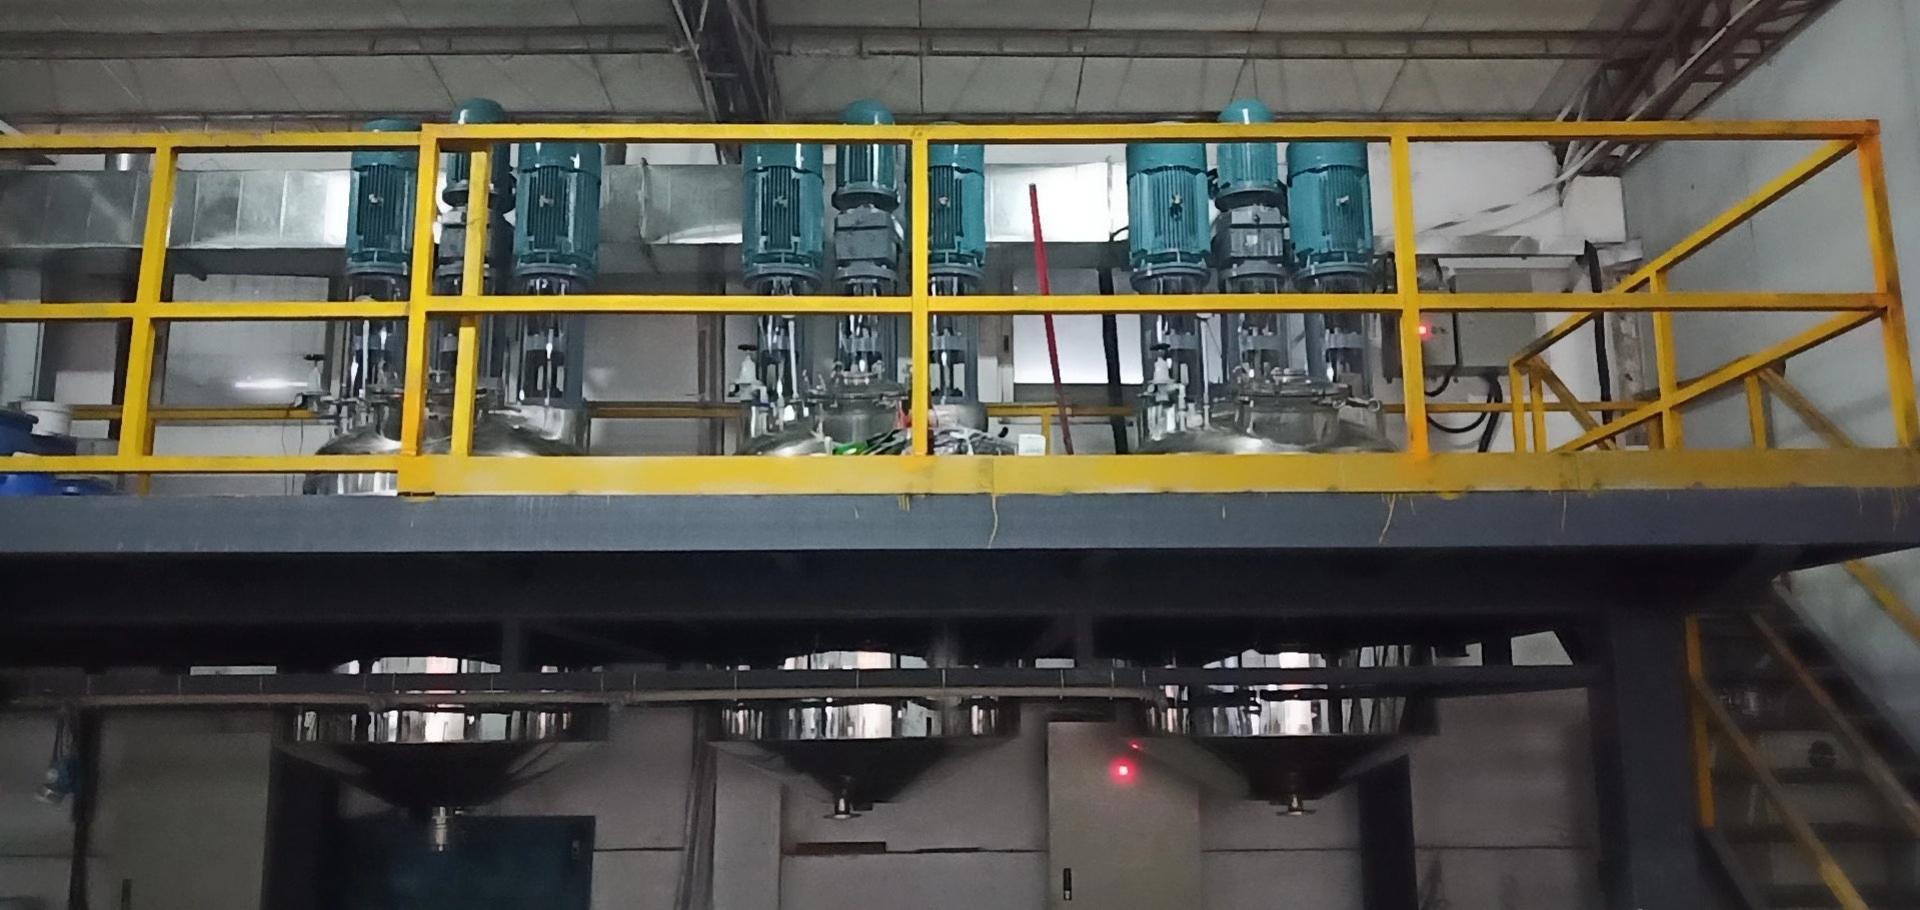 3 shafts mixing kettle.jpg